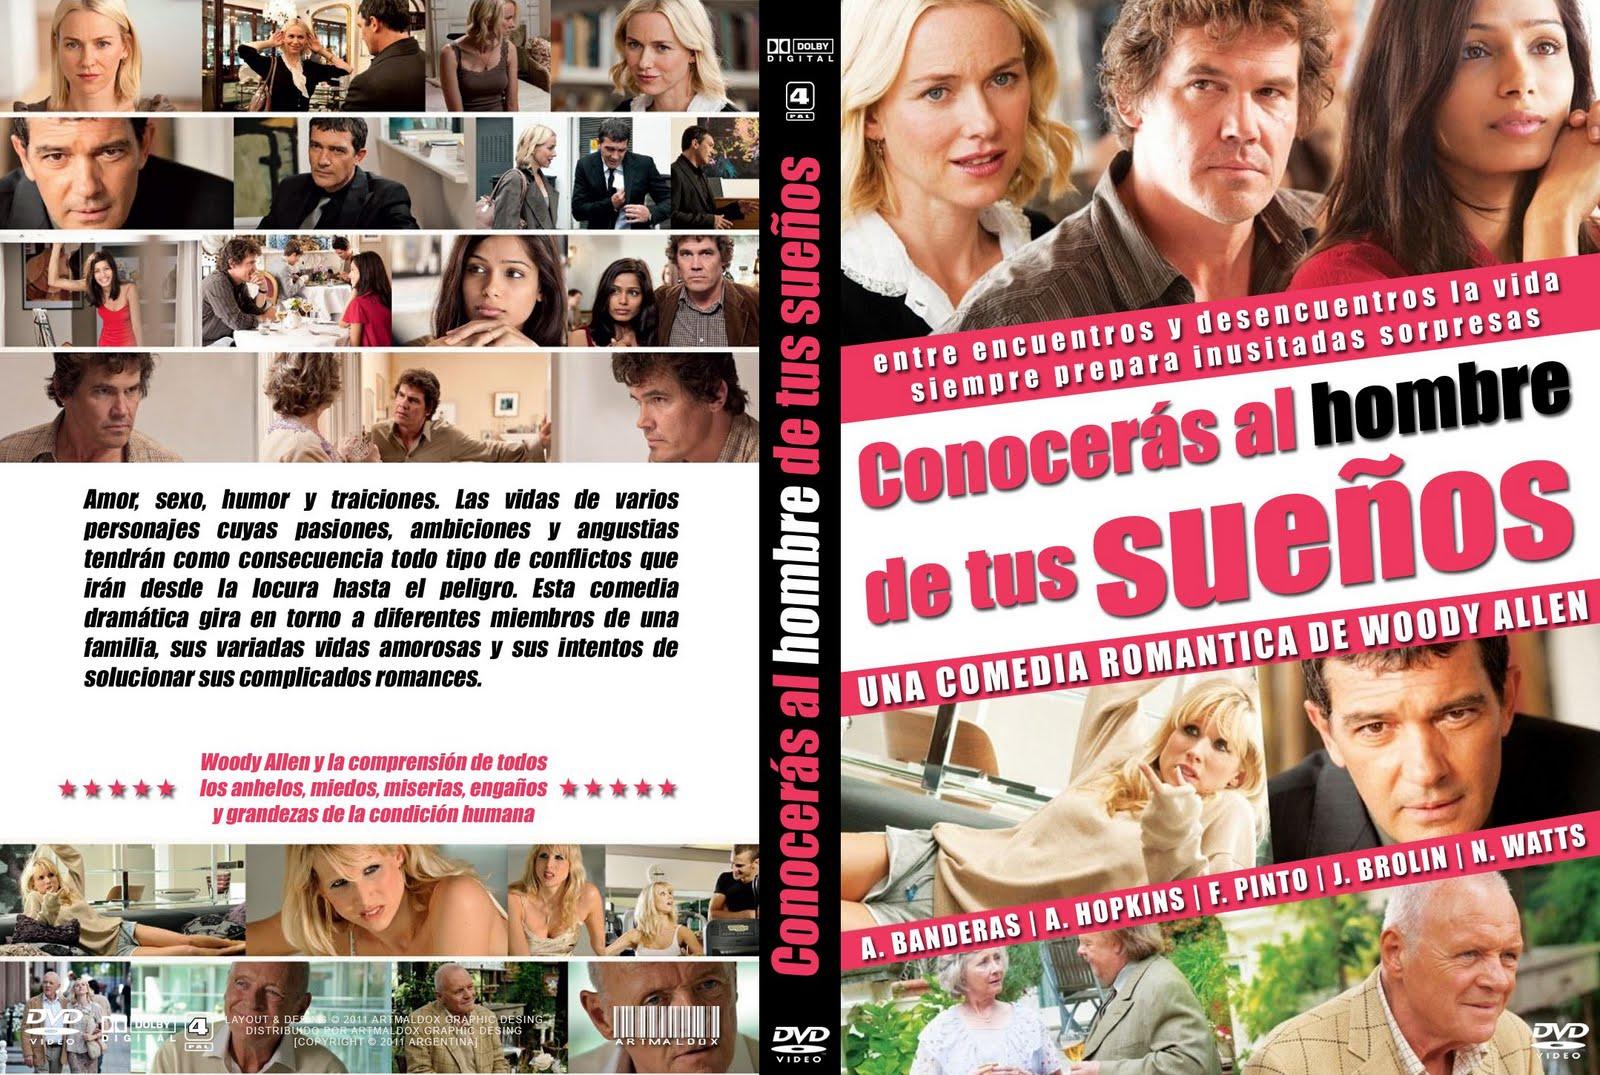 http://1.bp.blogspot.com/-D_p5W5nmIbU/TiTA1LdhwHI/AAAAAAAAAO0/WrbSbUpqGhg/s1600/Conoceras+Al+Hombre+De+Tus+Suenos+Custom+V2+Por+Artmaldox+-+dvd.jpg